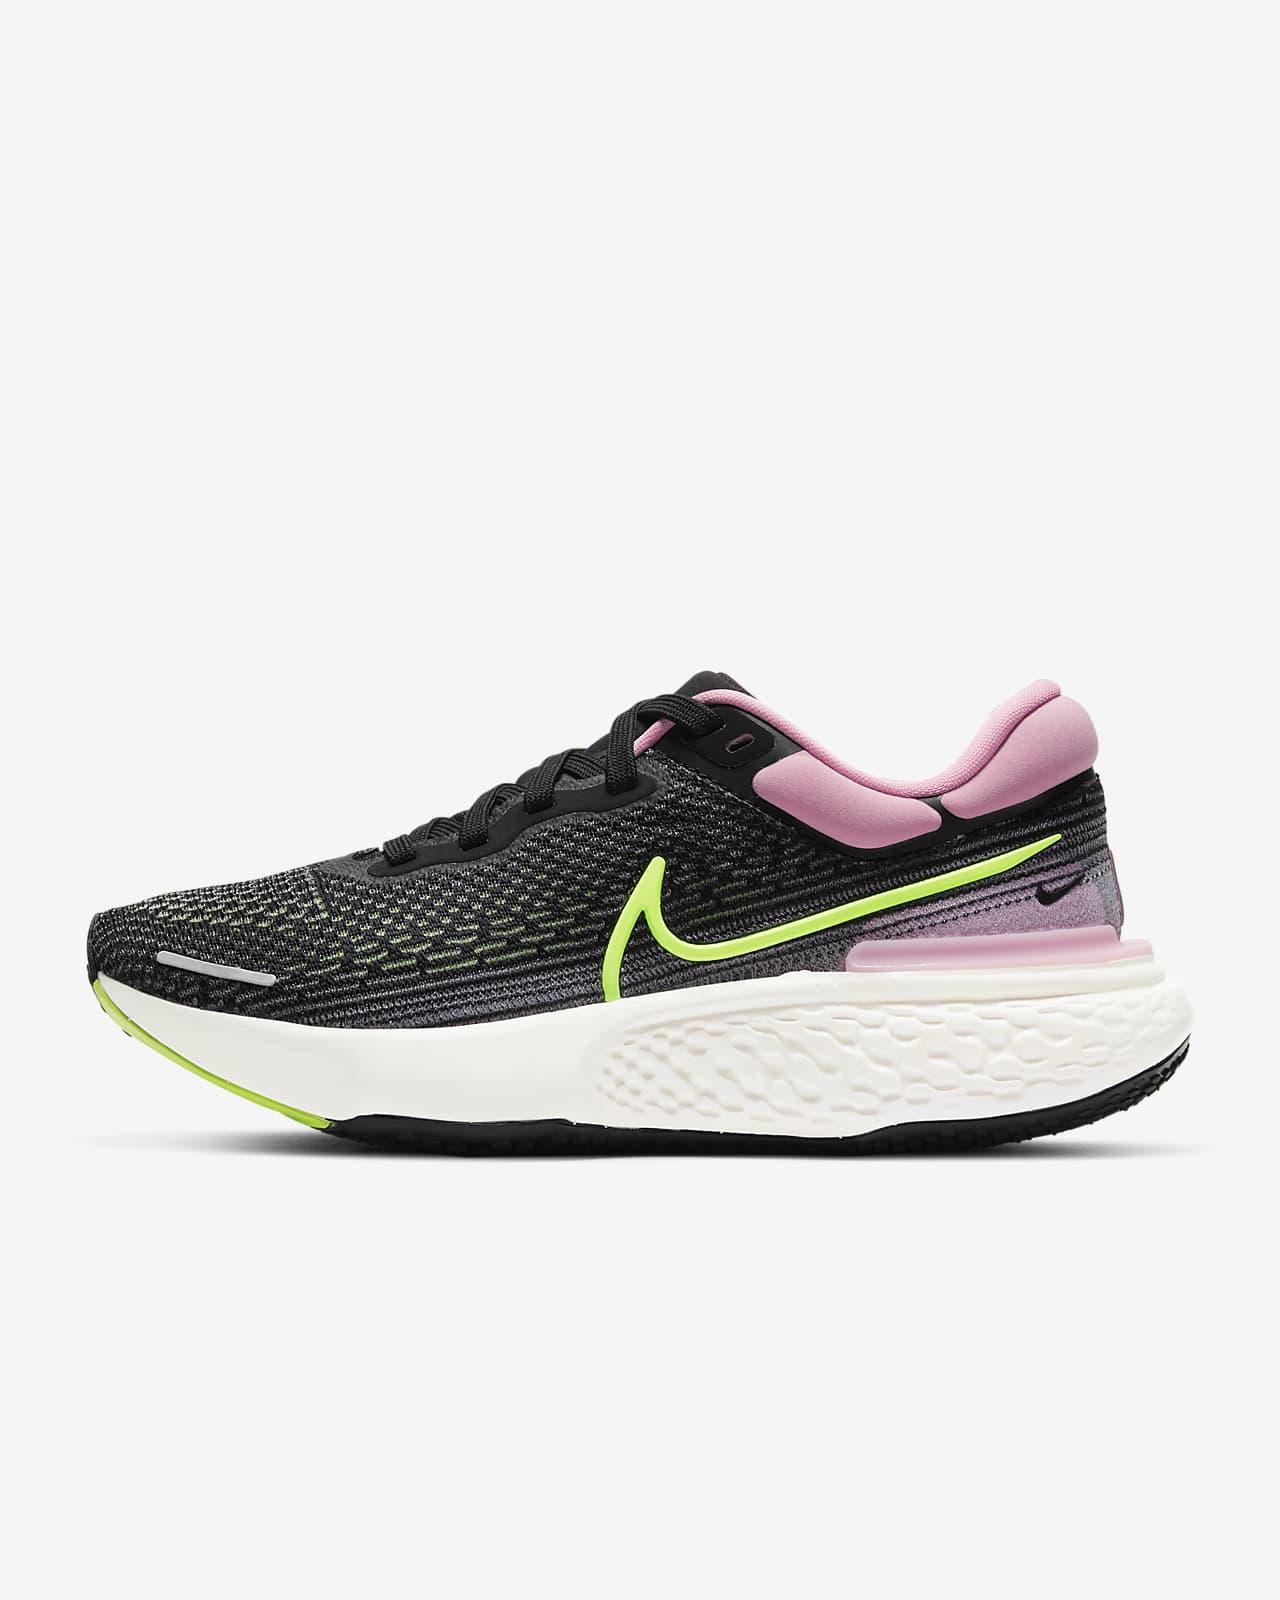 Женские беговые кроссовки Nike ZoomX Invincible Run Flyknit